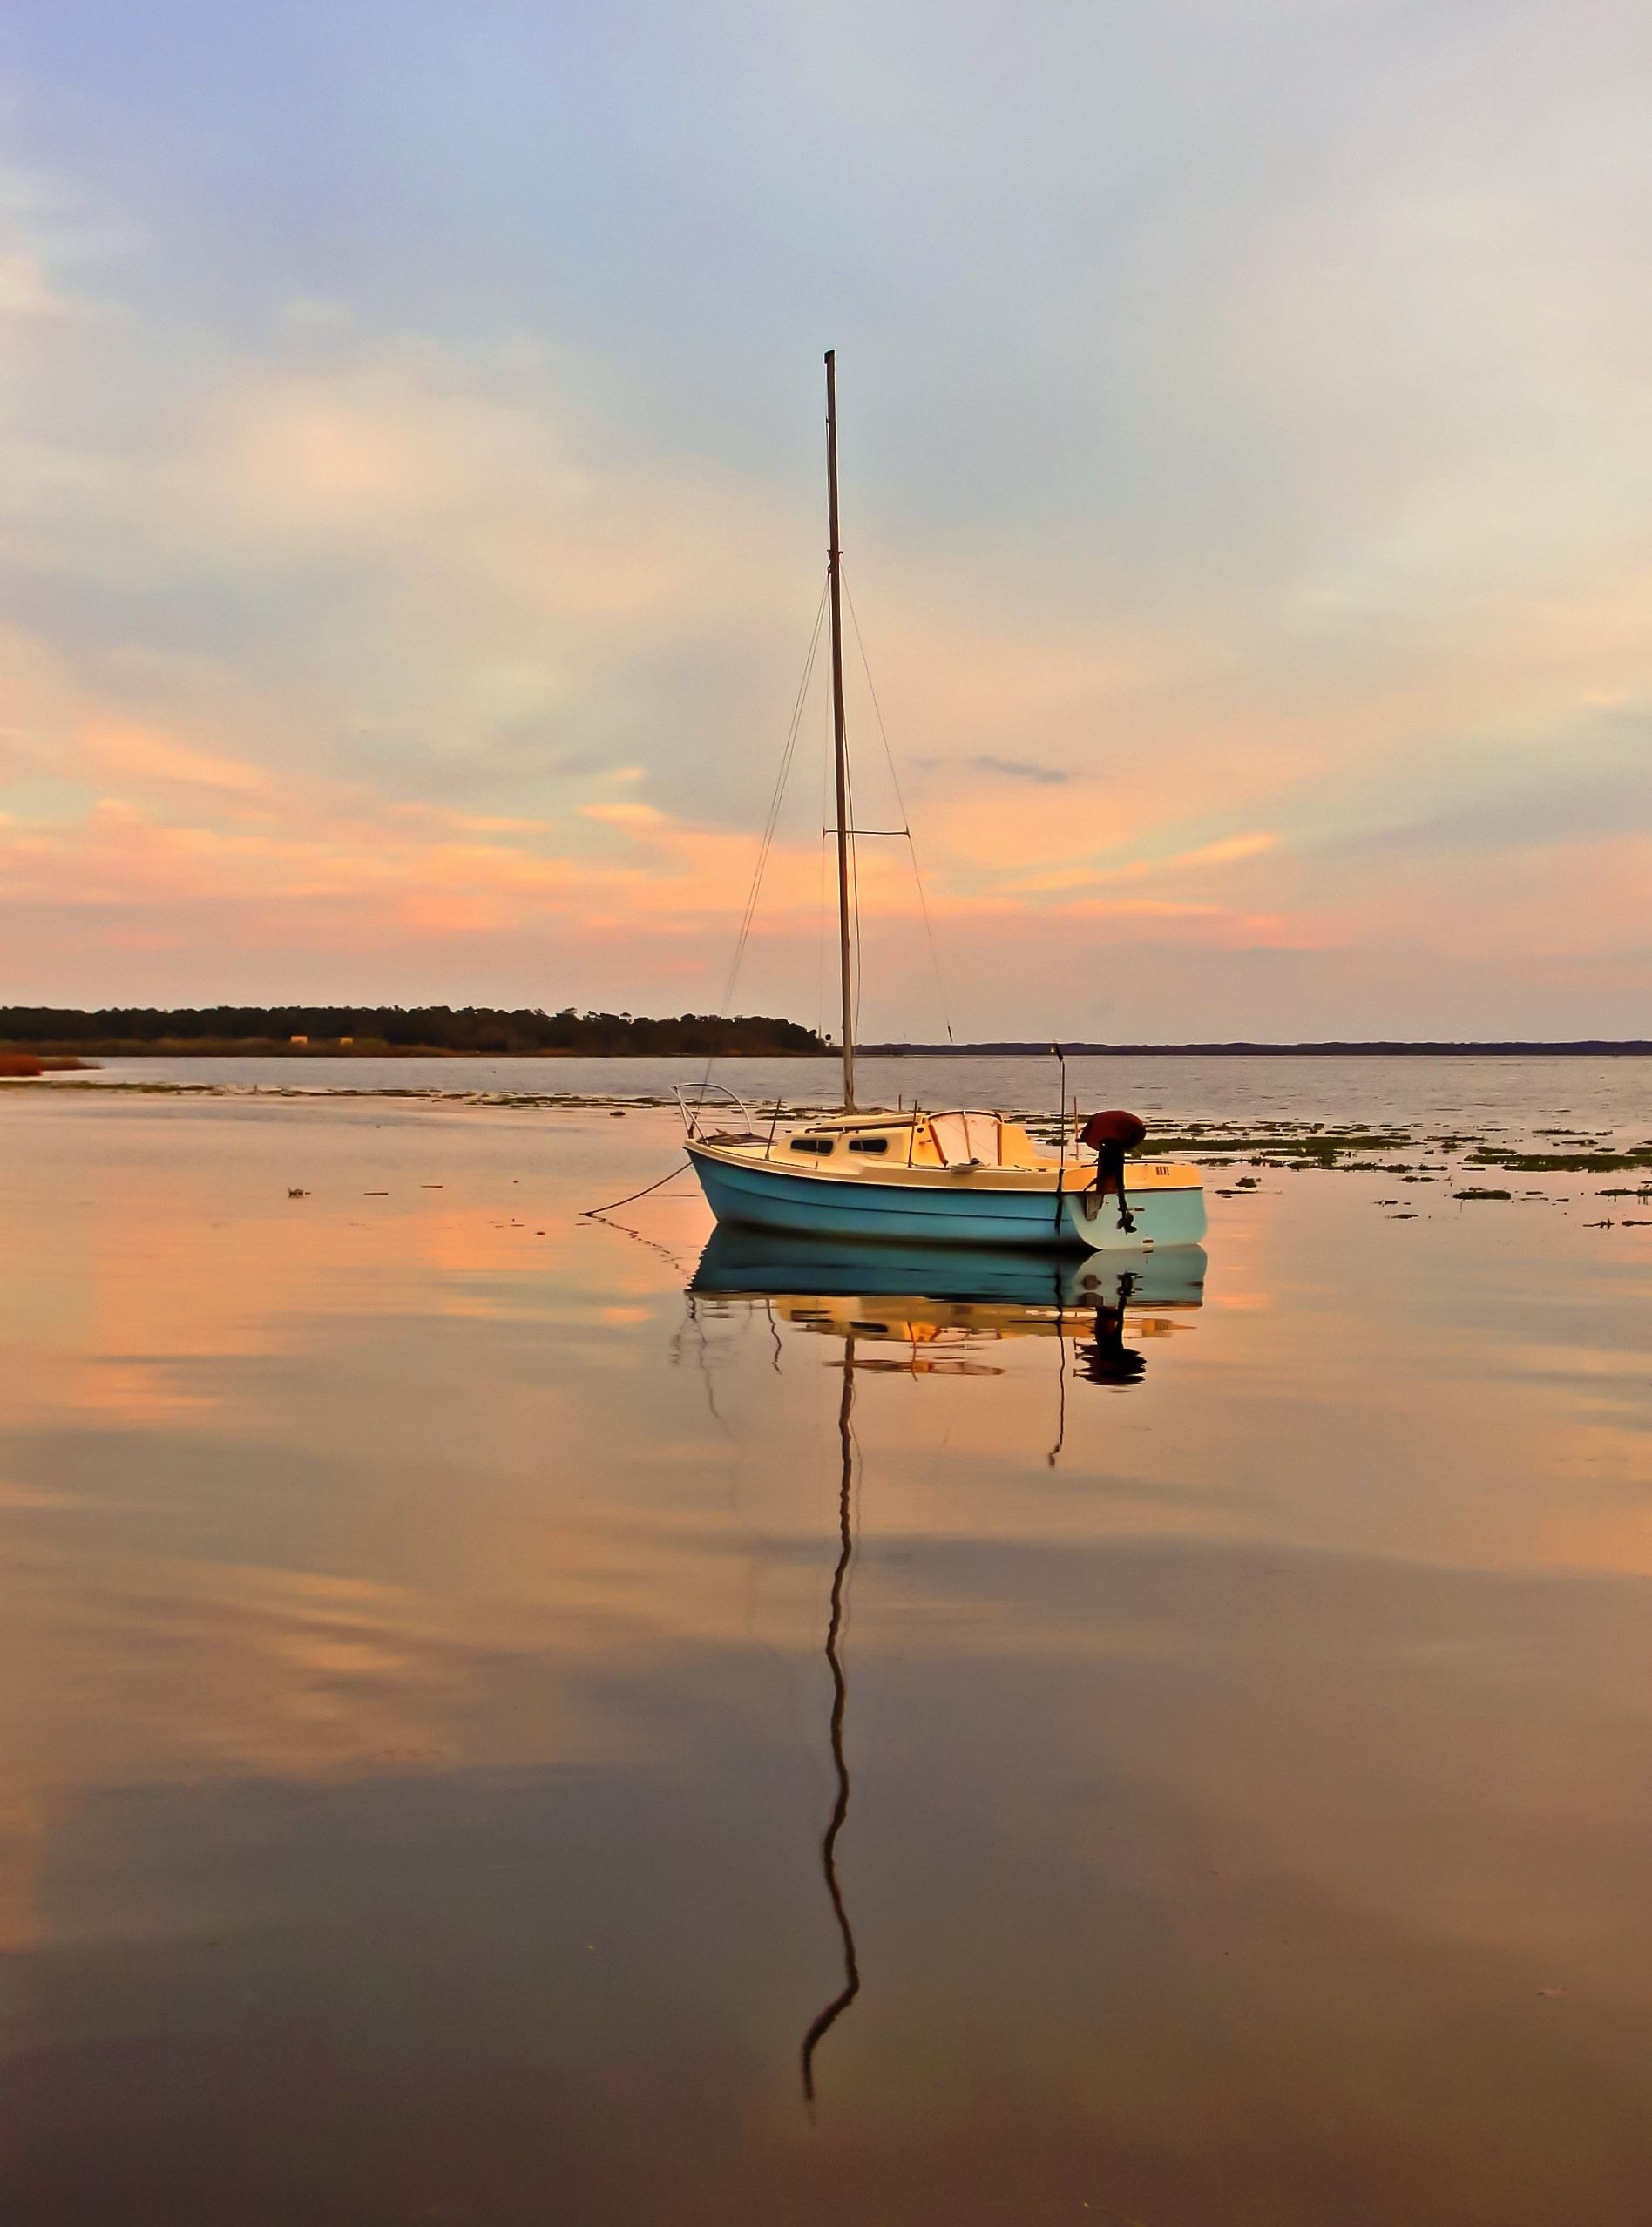 Magic Time Sail Boats Photography Beach Scenes Photo Moon boat sunset sail evening lake